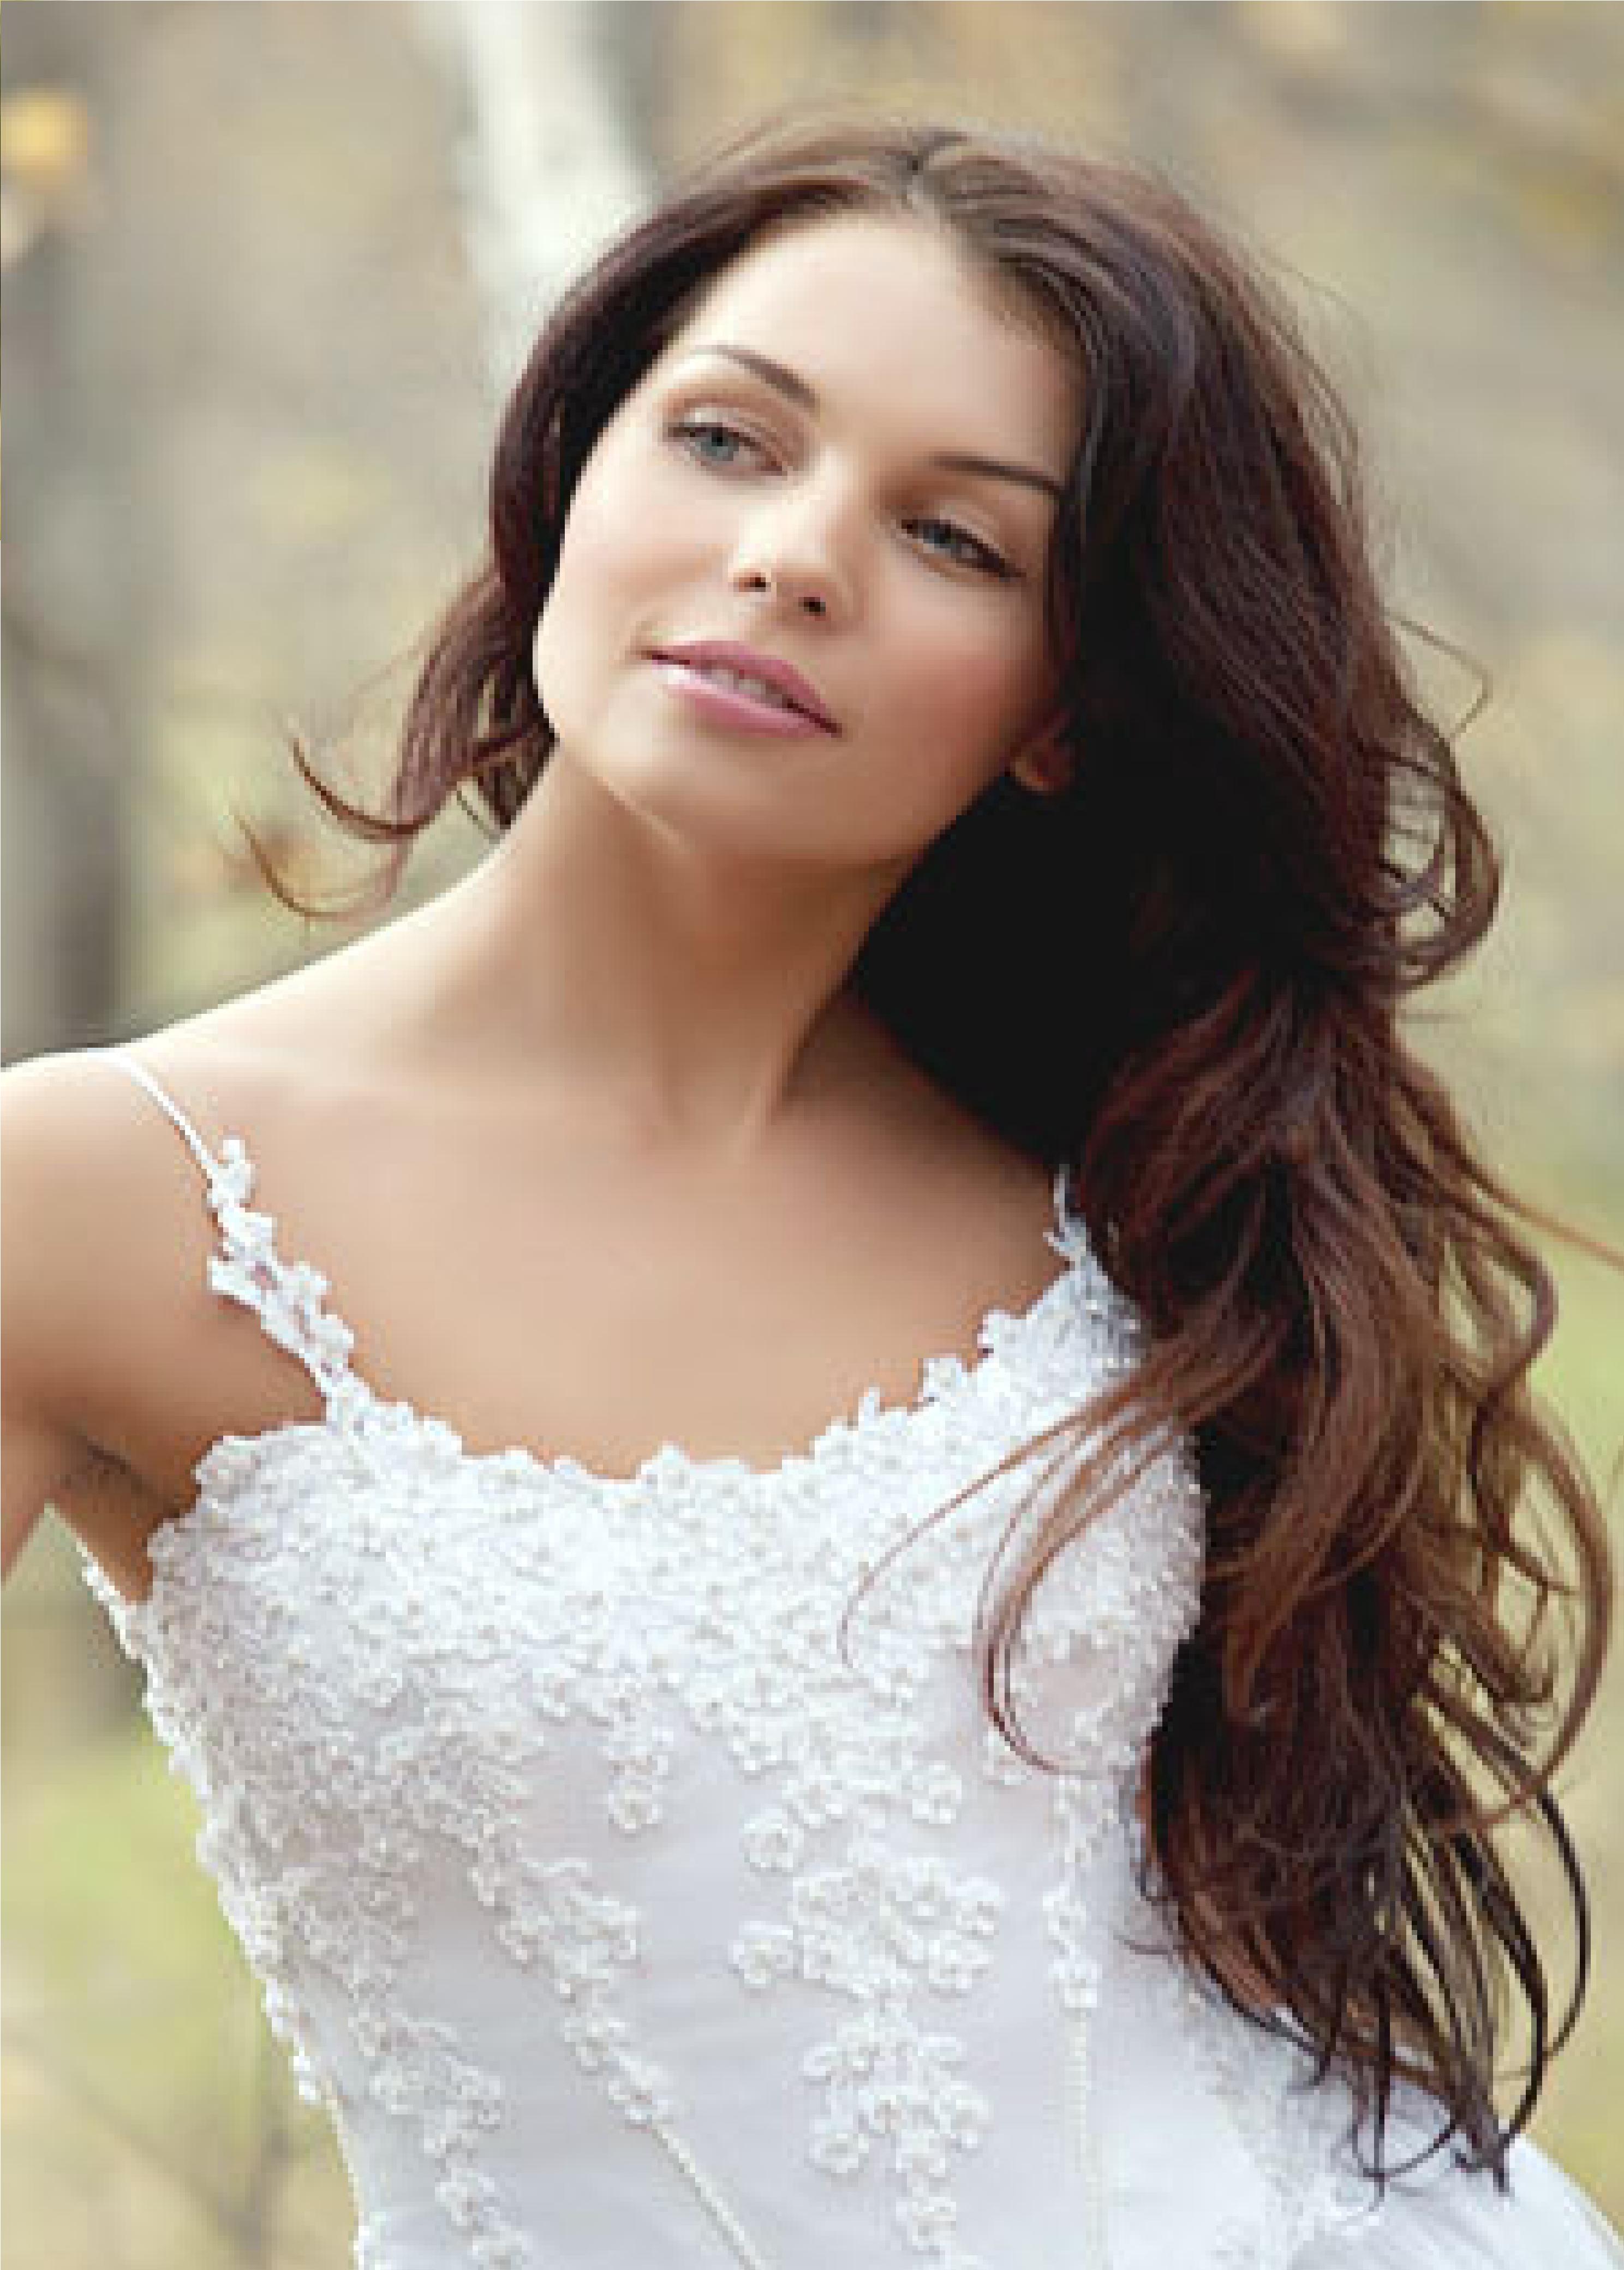 Best wedding dresses for under 1000  veronica veronicaargyle on Pinterest